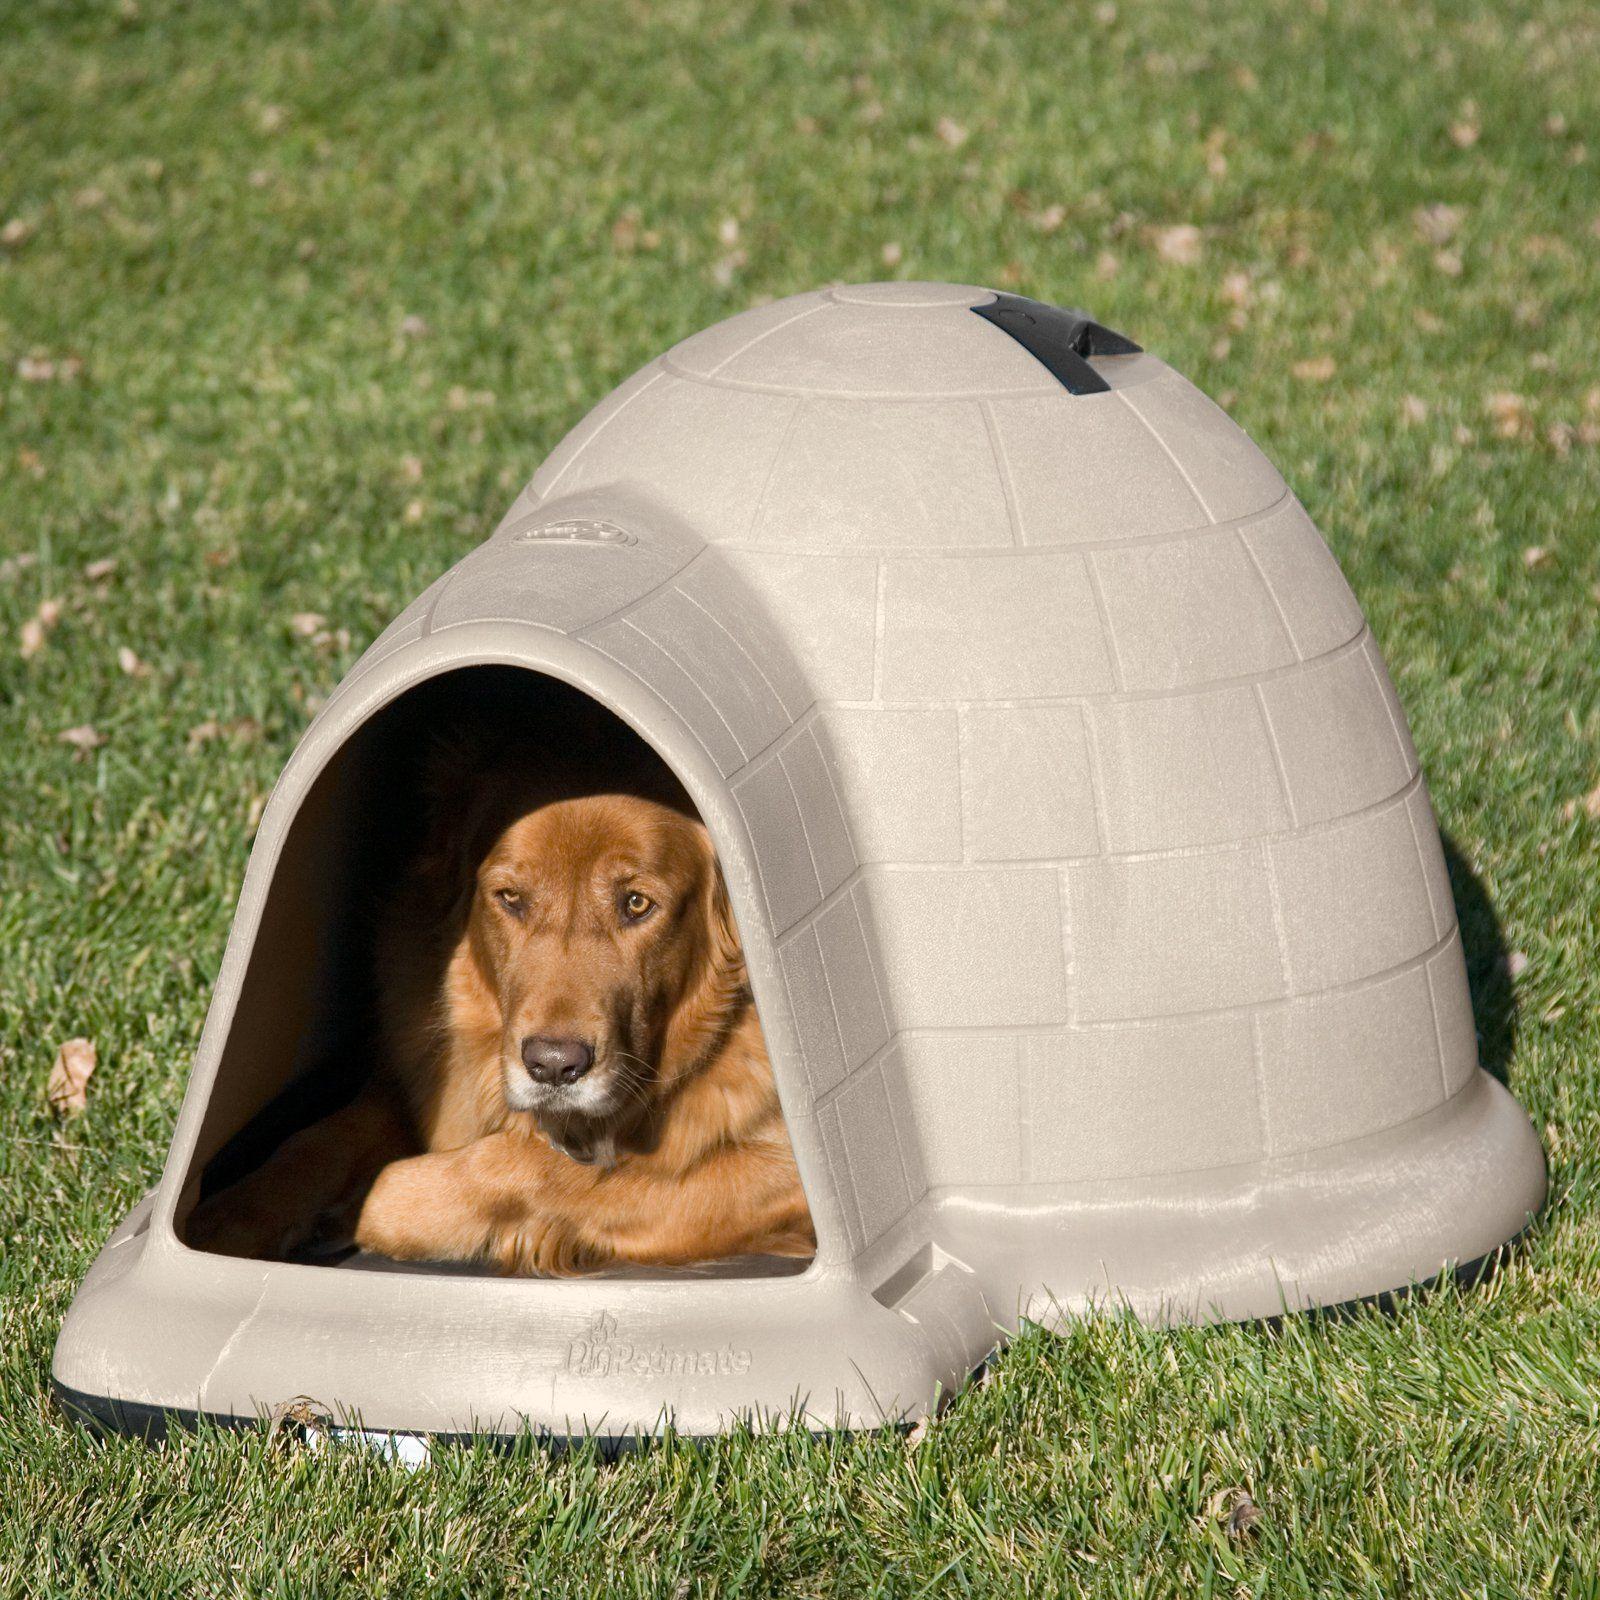 Petmate Indigo Dog House Tan Www Hayneedle Com Igloo Dog House Dog House Dog Door